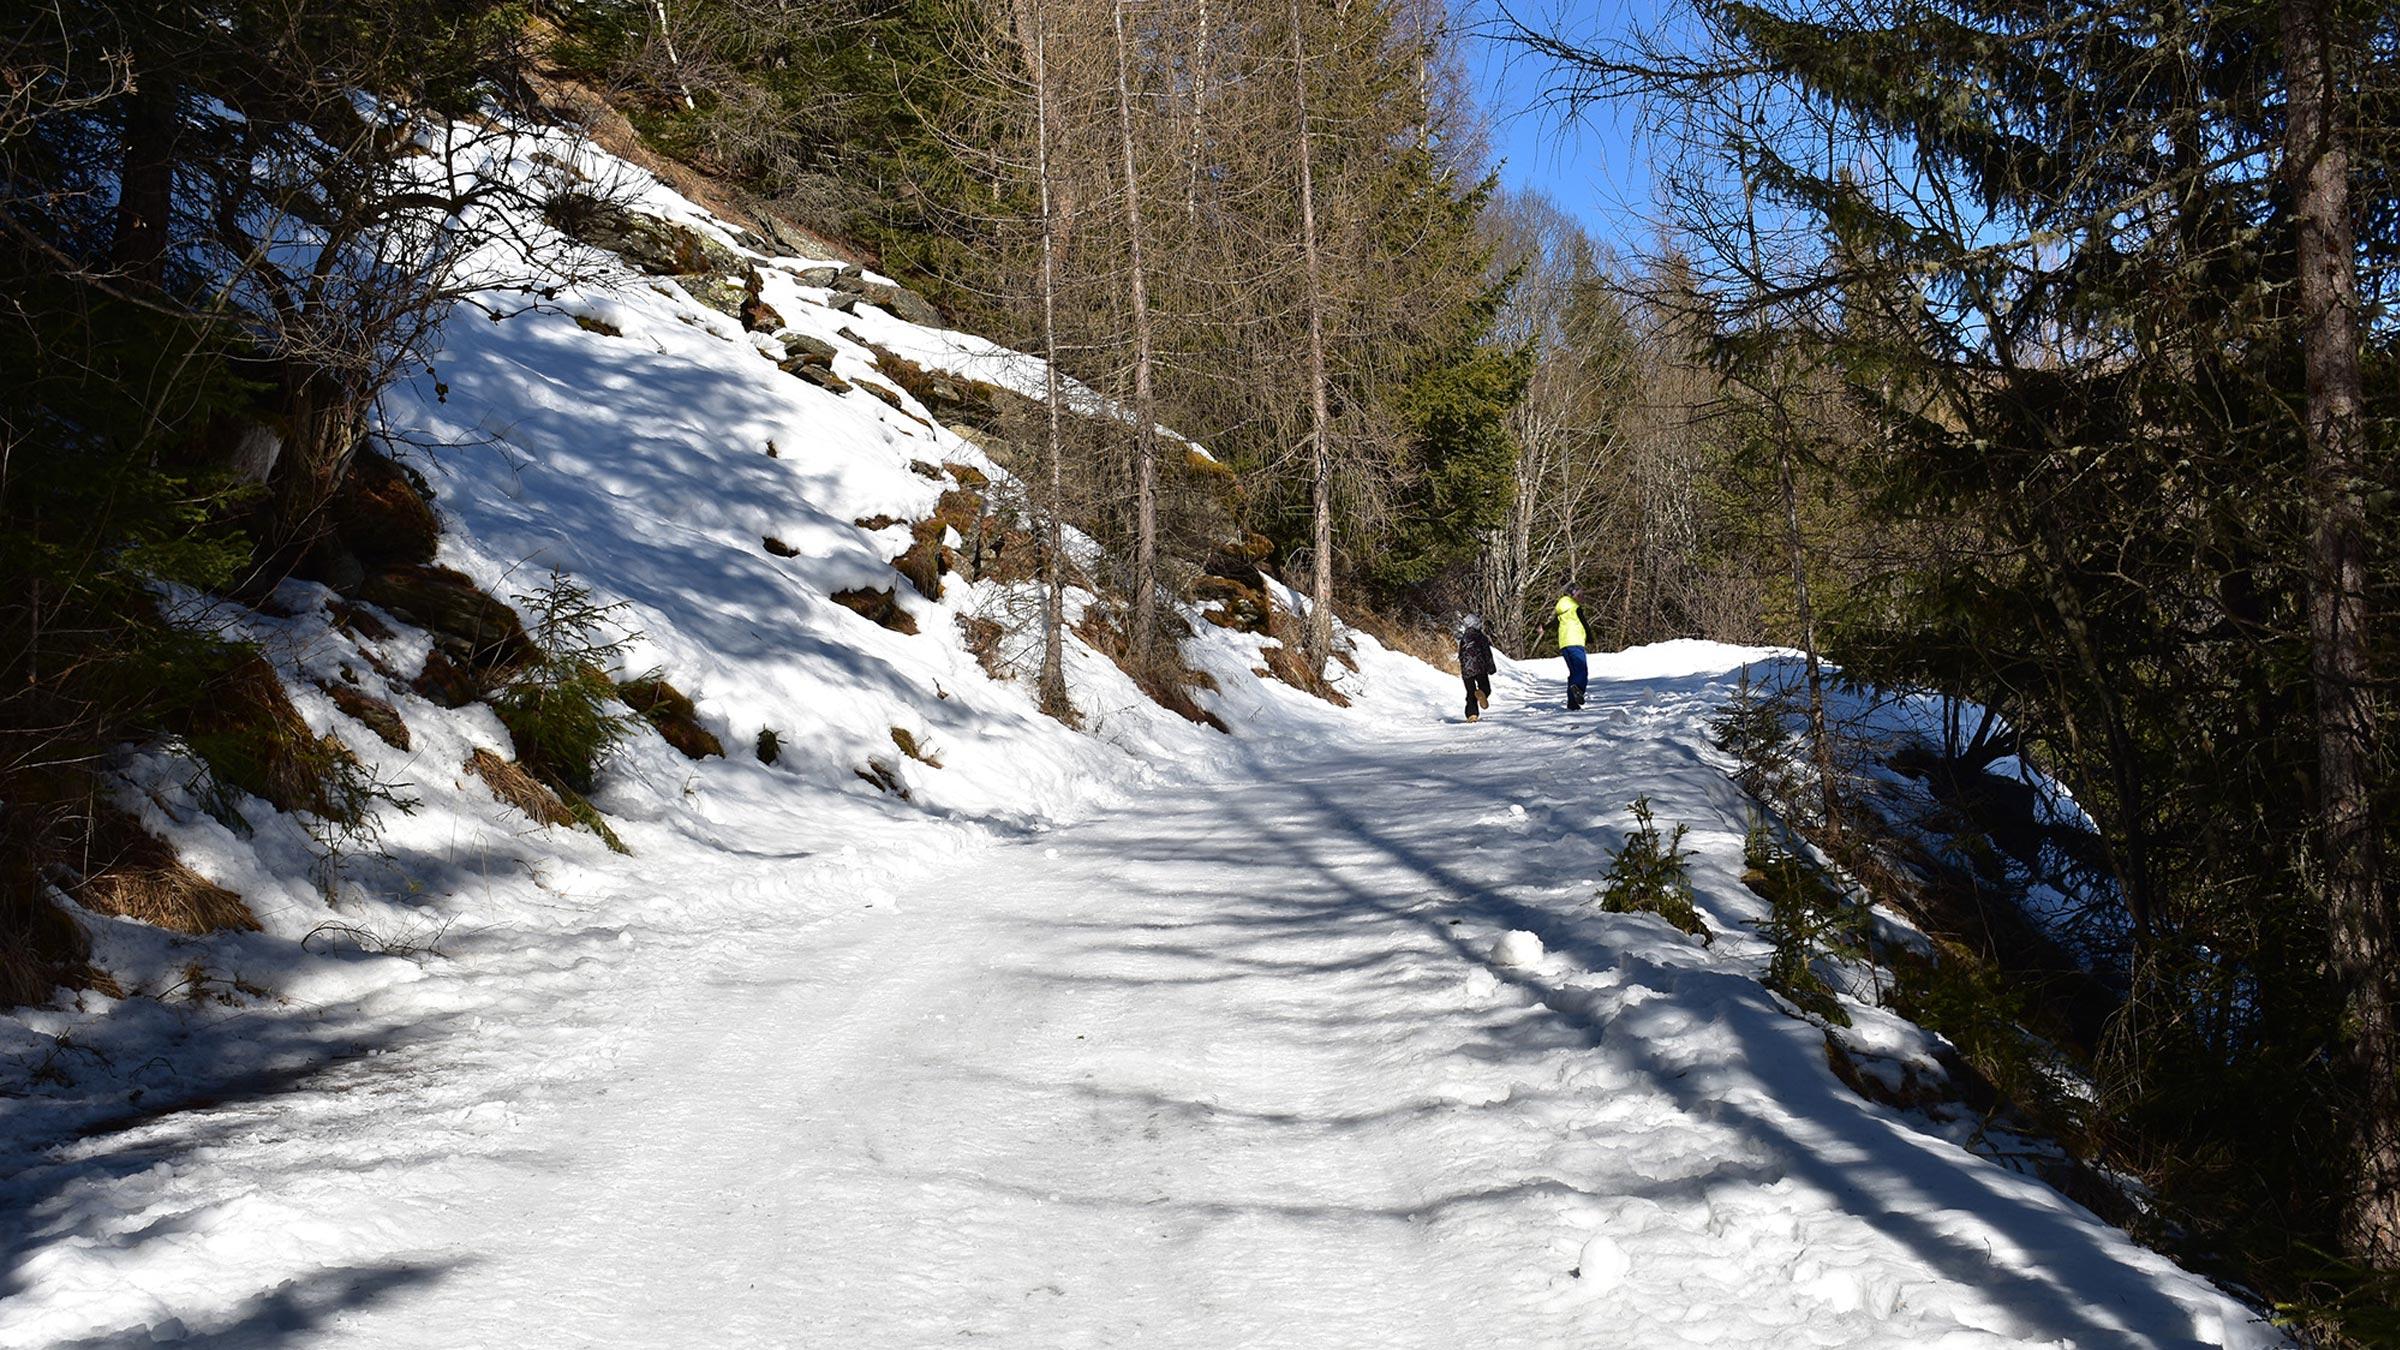 Auf dem Weg zur Wurzbergalm - Rodelbahn Wurzbergalm Ötztal